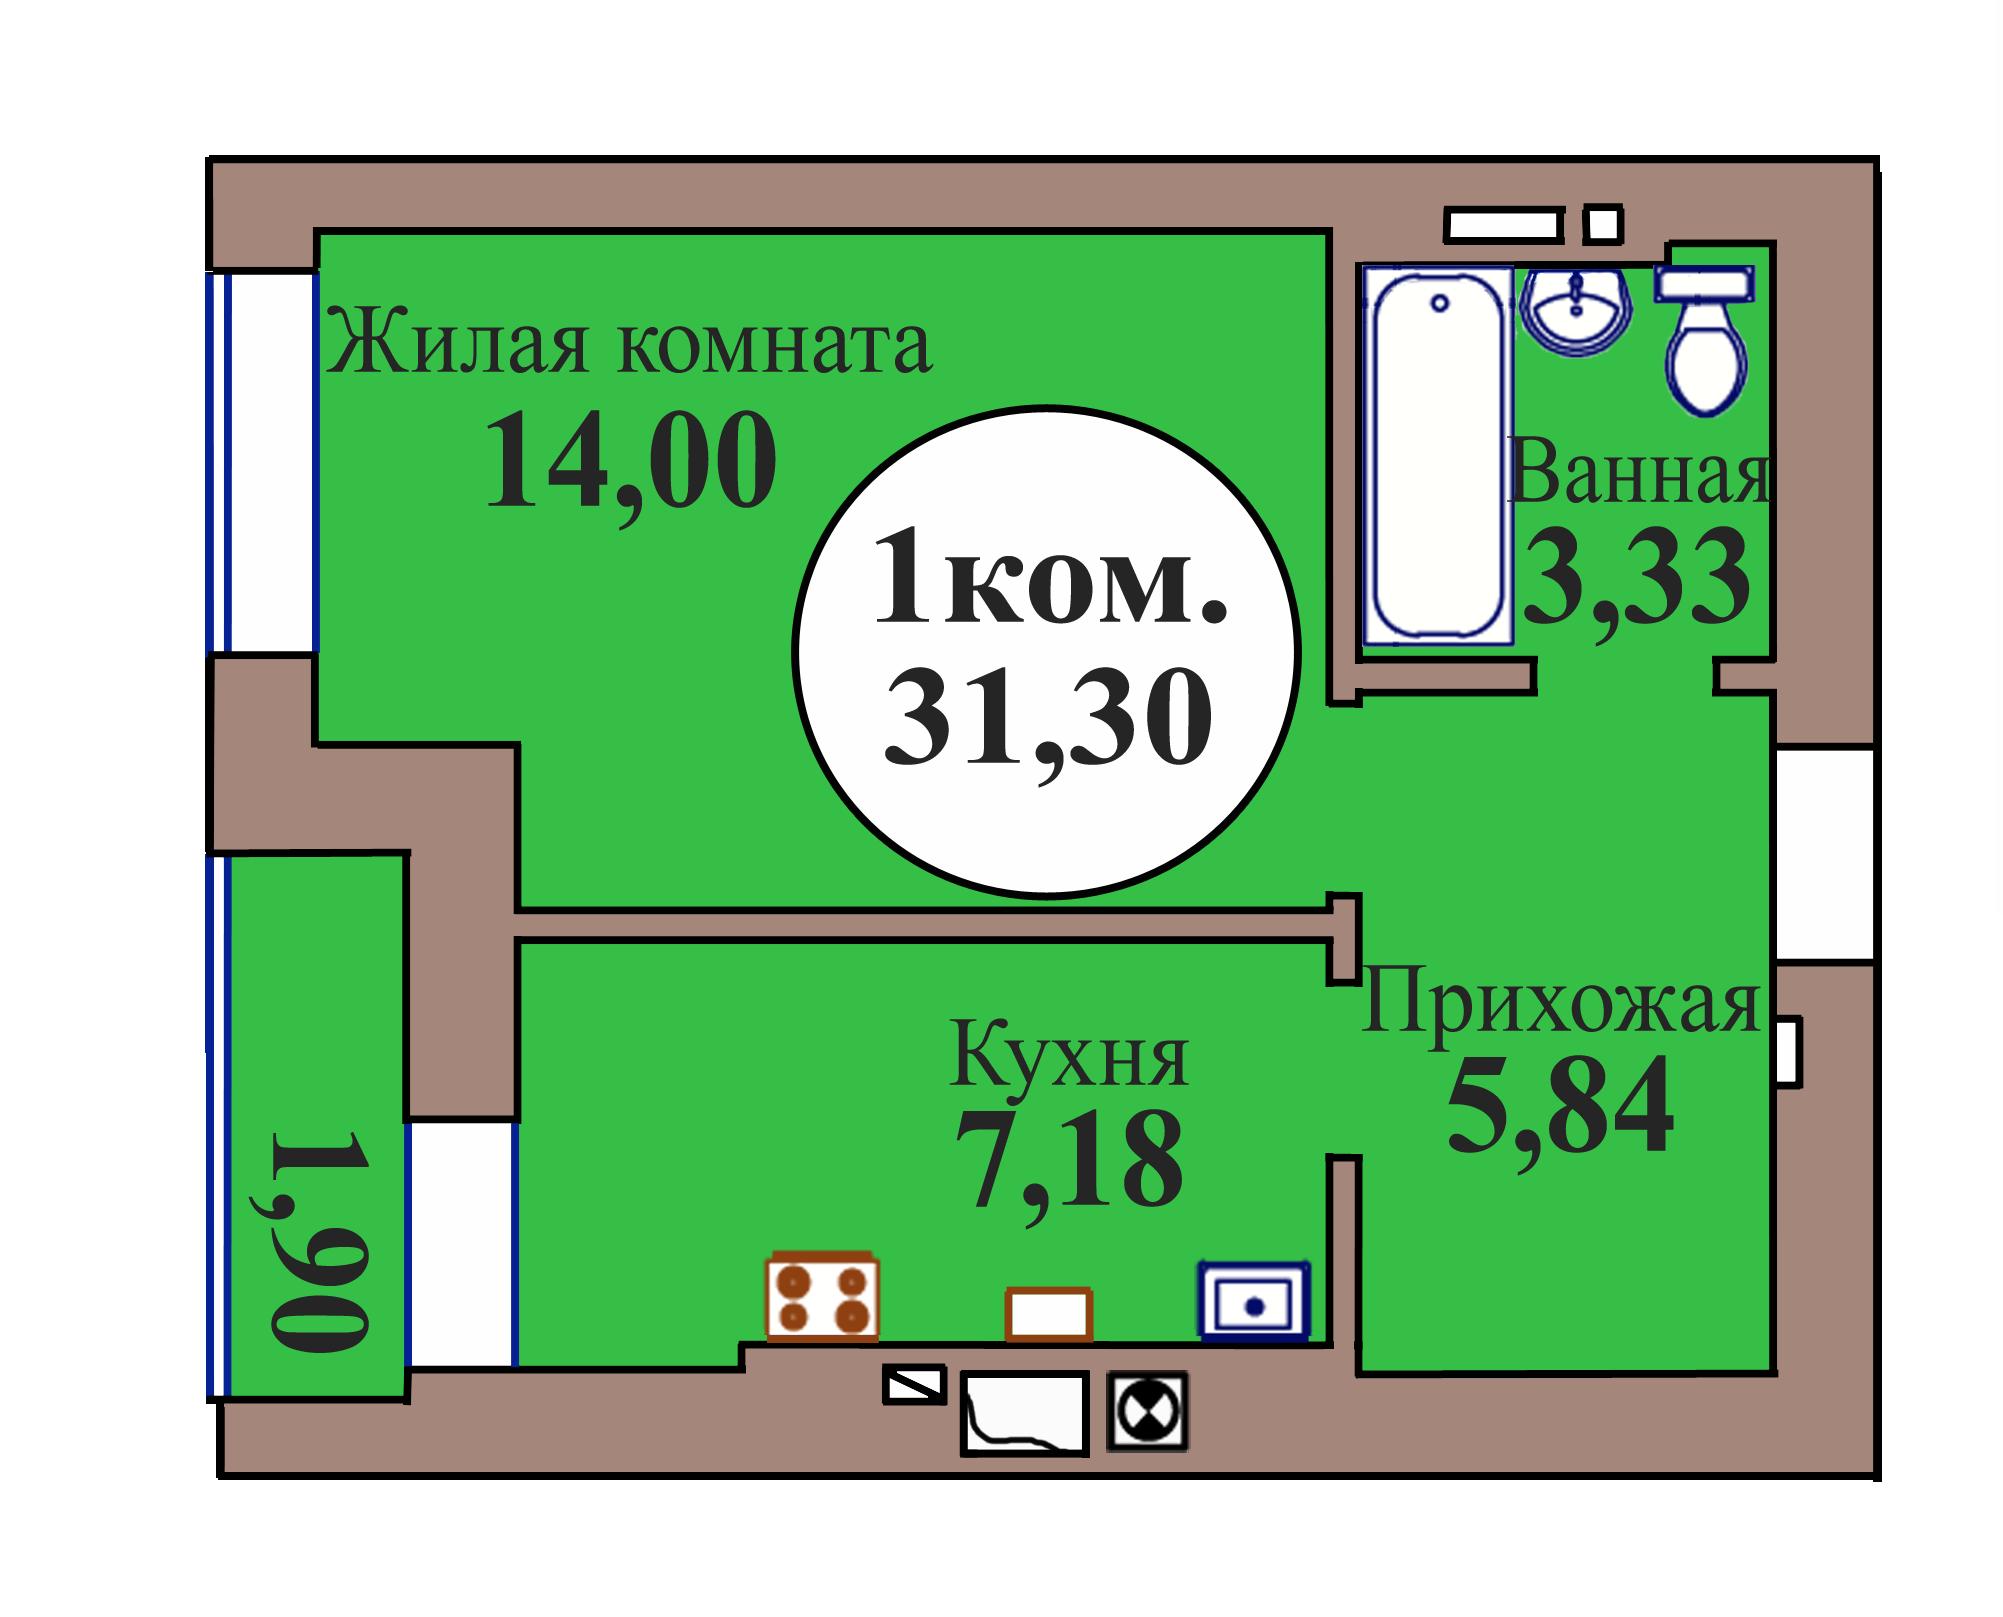 1-комн. кв. по пер. Калининградский, 5 кв. 27 в Калининграде